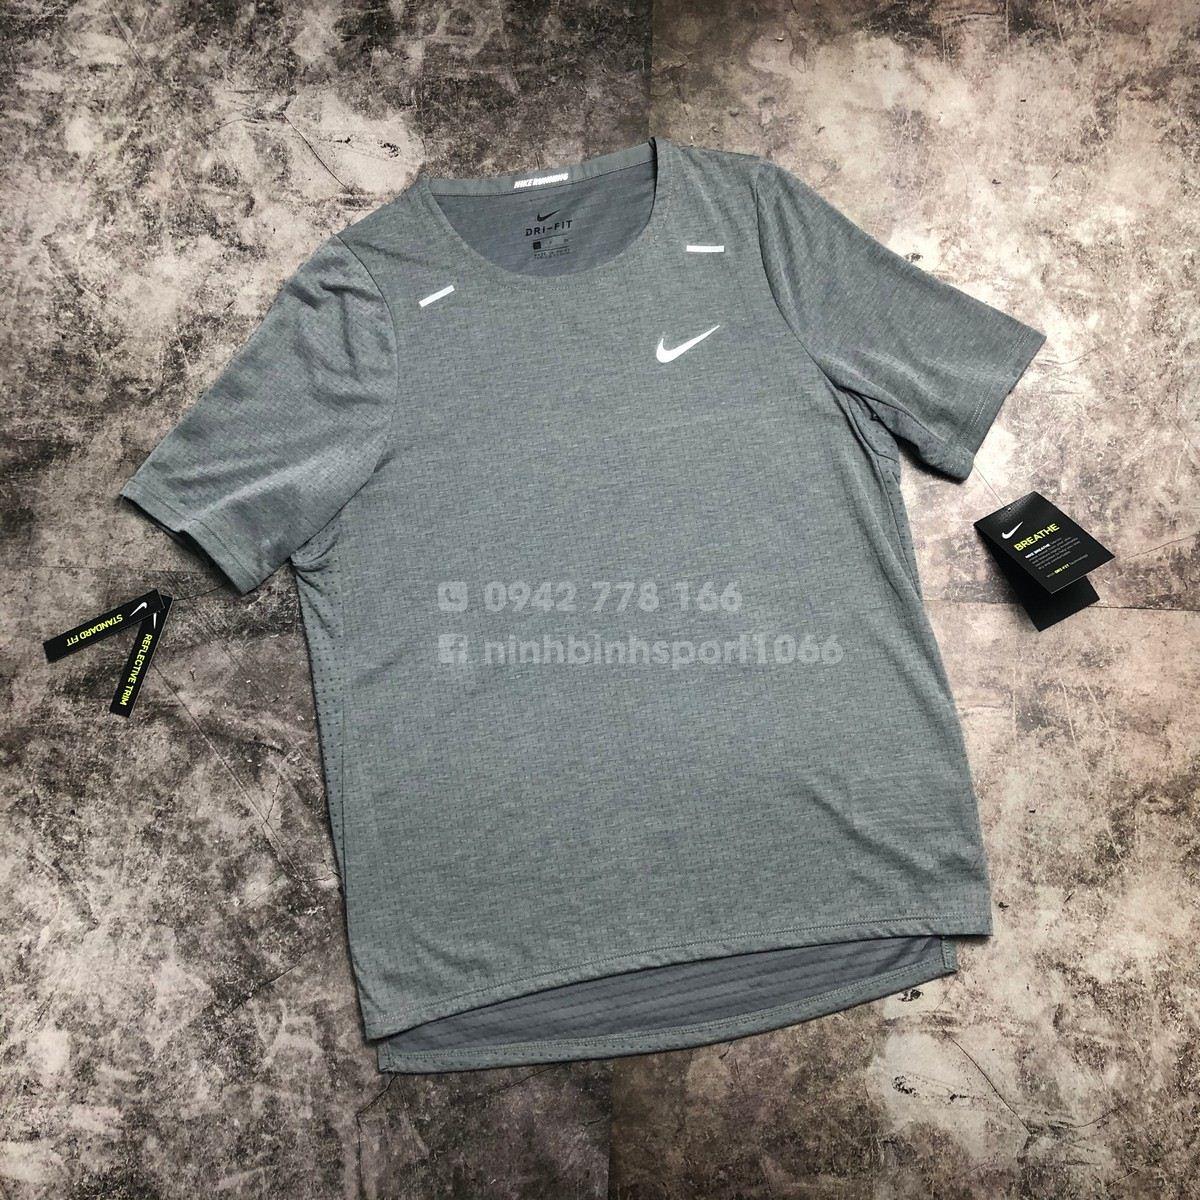 Áo thể thao nam Nike Rise 365 Men's Running CJ5421-097